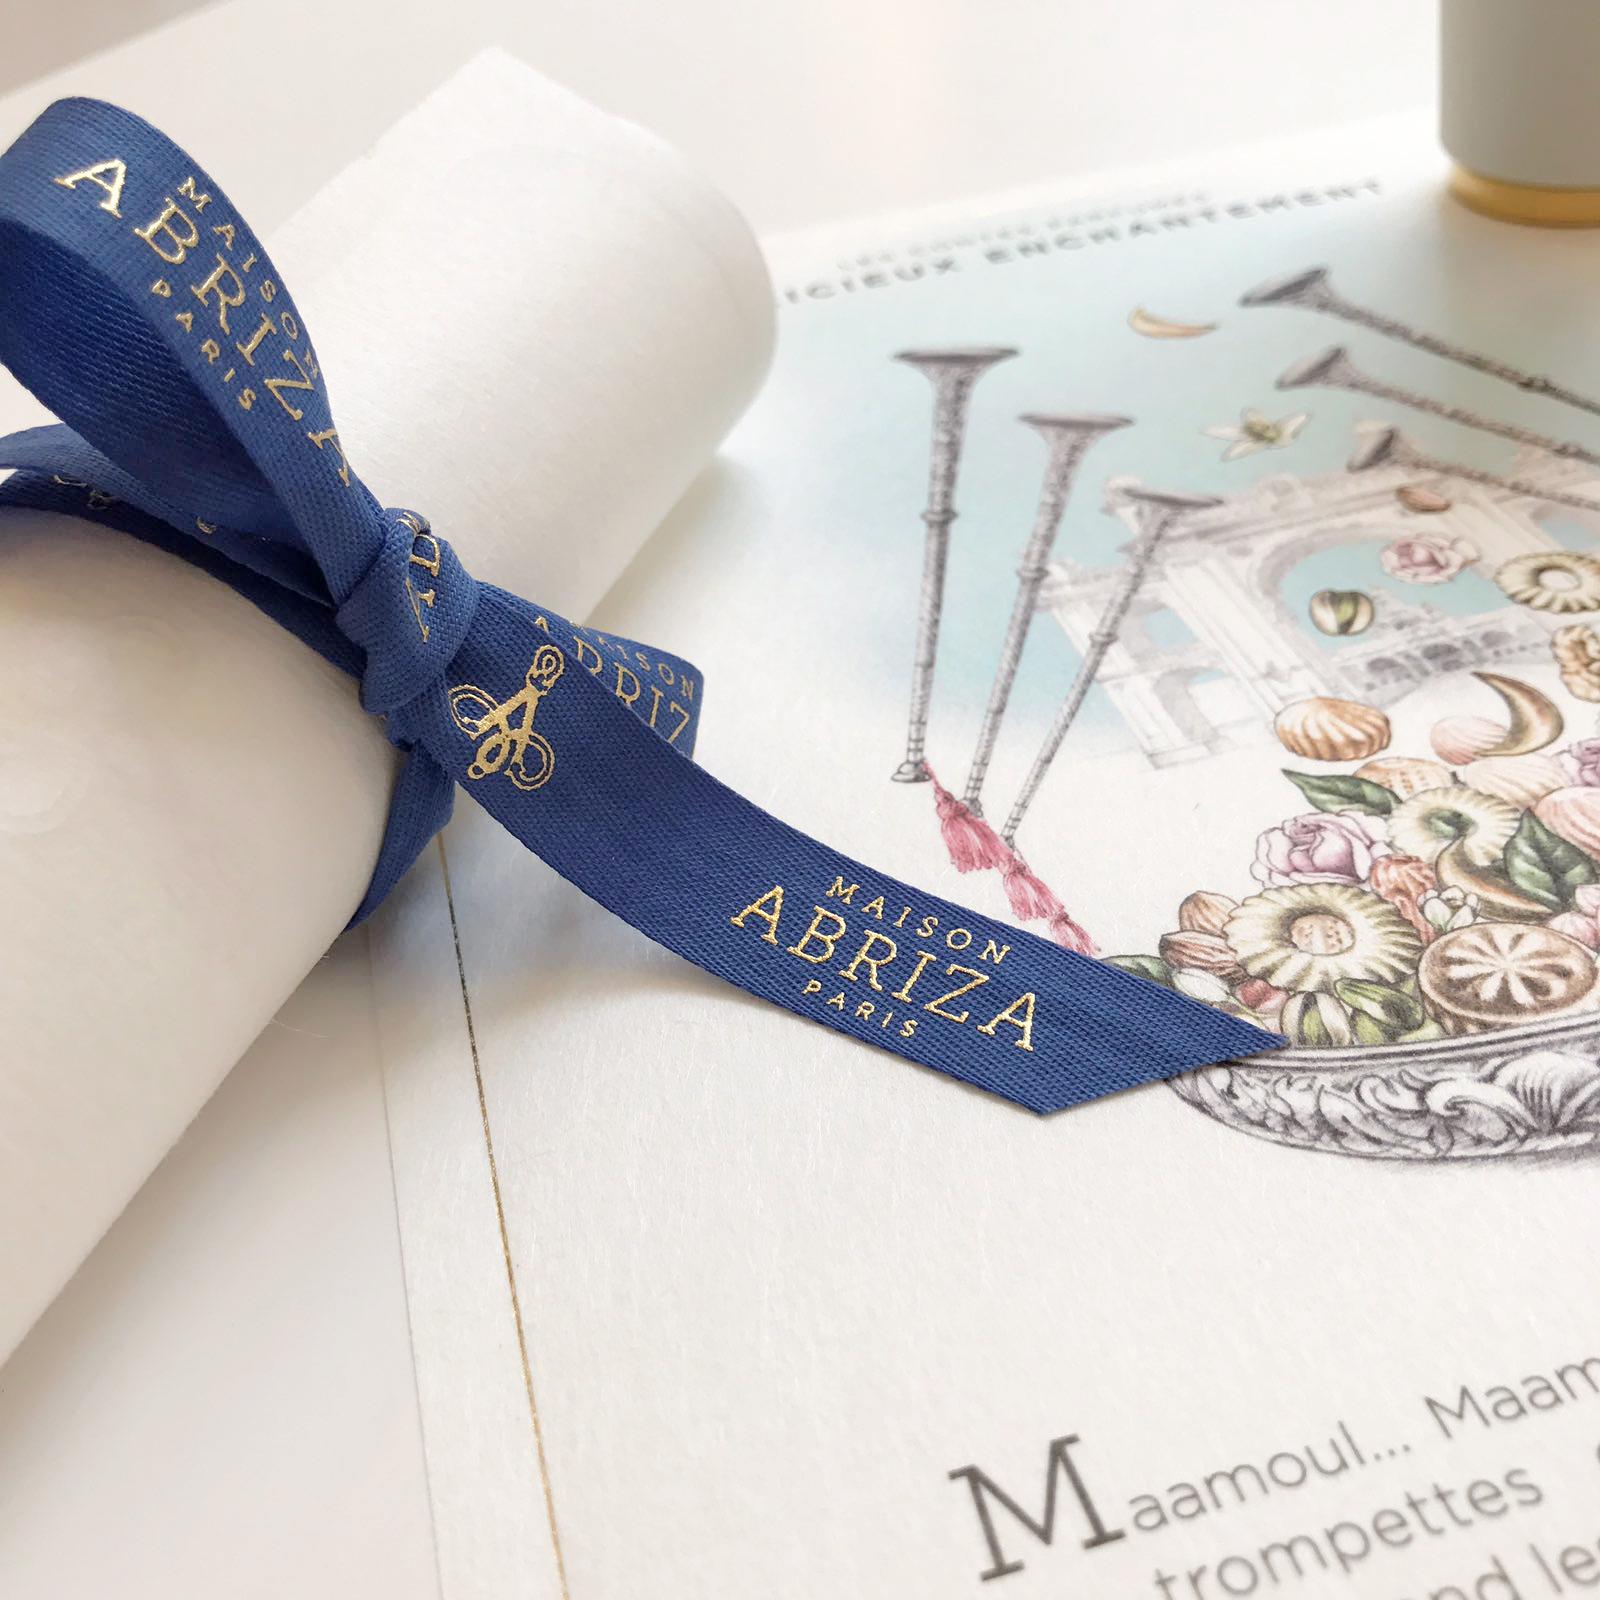 1703-FACTORY-ABRIZA-CONTES-01